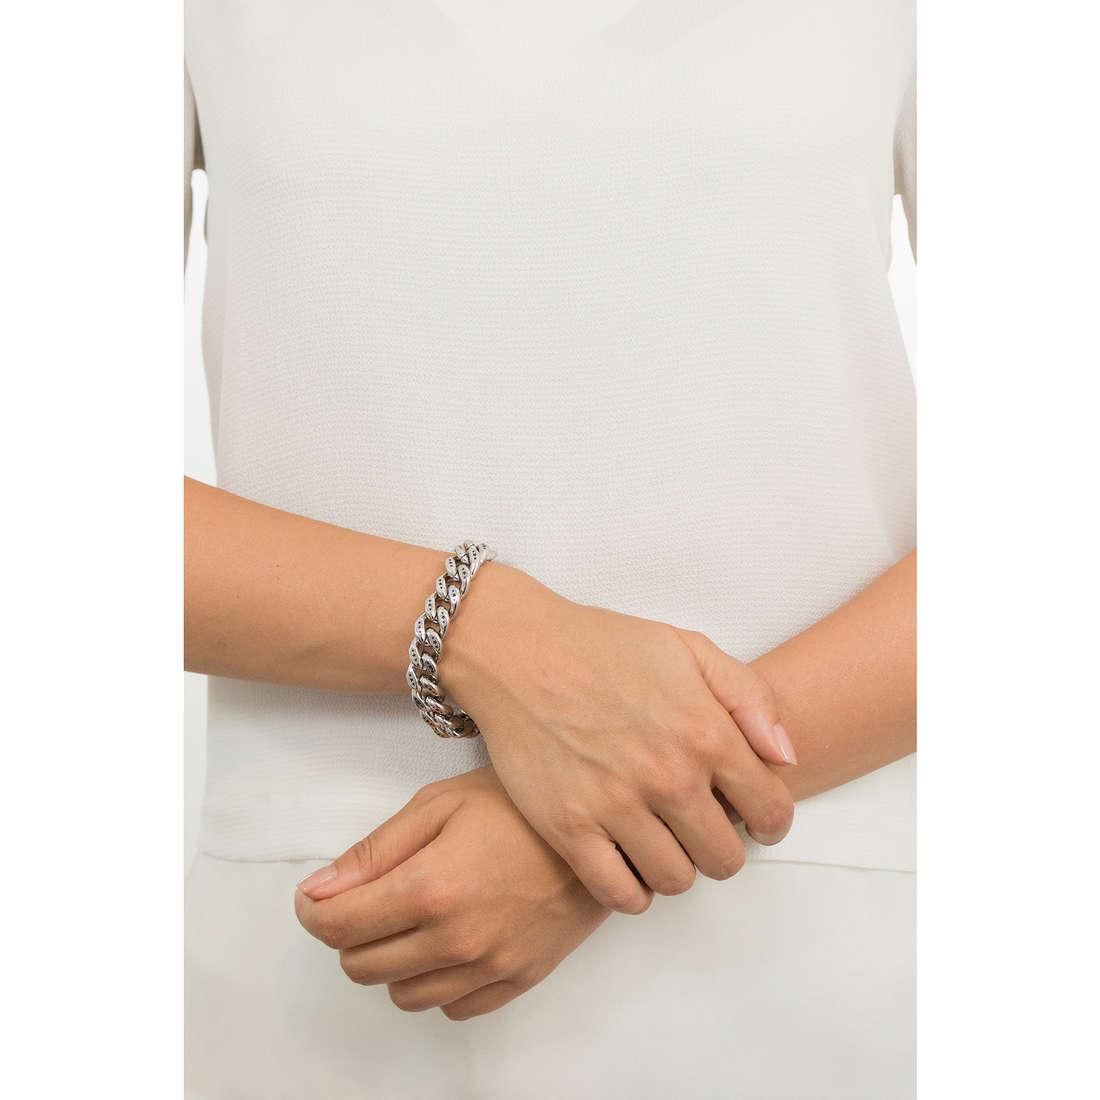 Nomination bracelets Starlight woman 131503/007 indosso